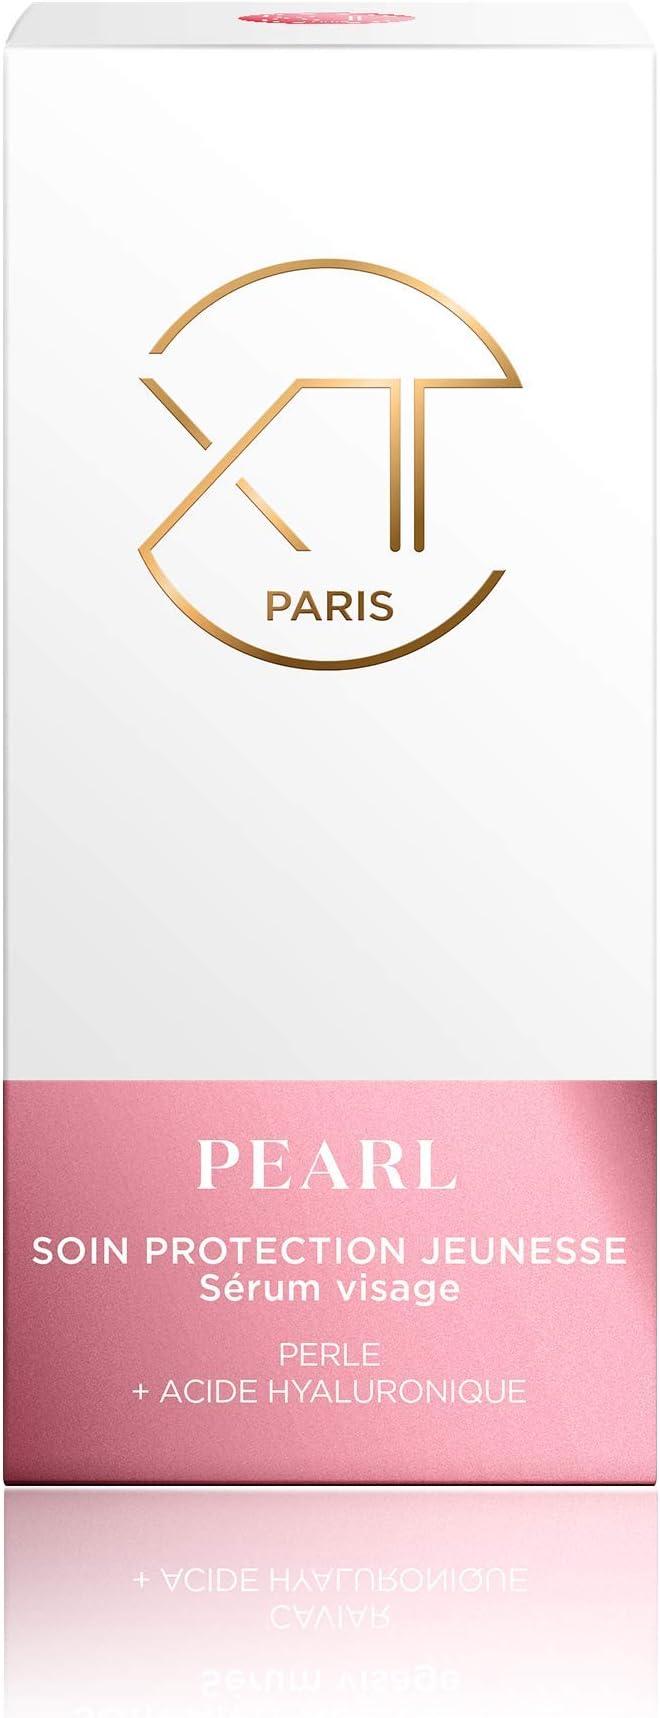 XT PARIS - Colección XT PEARL - Suero facial protección ...